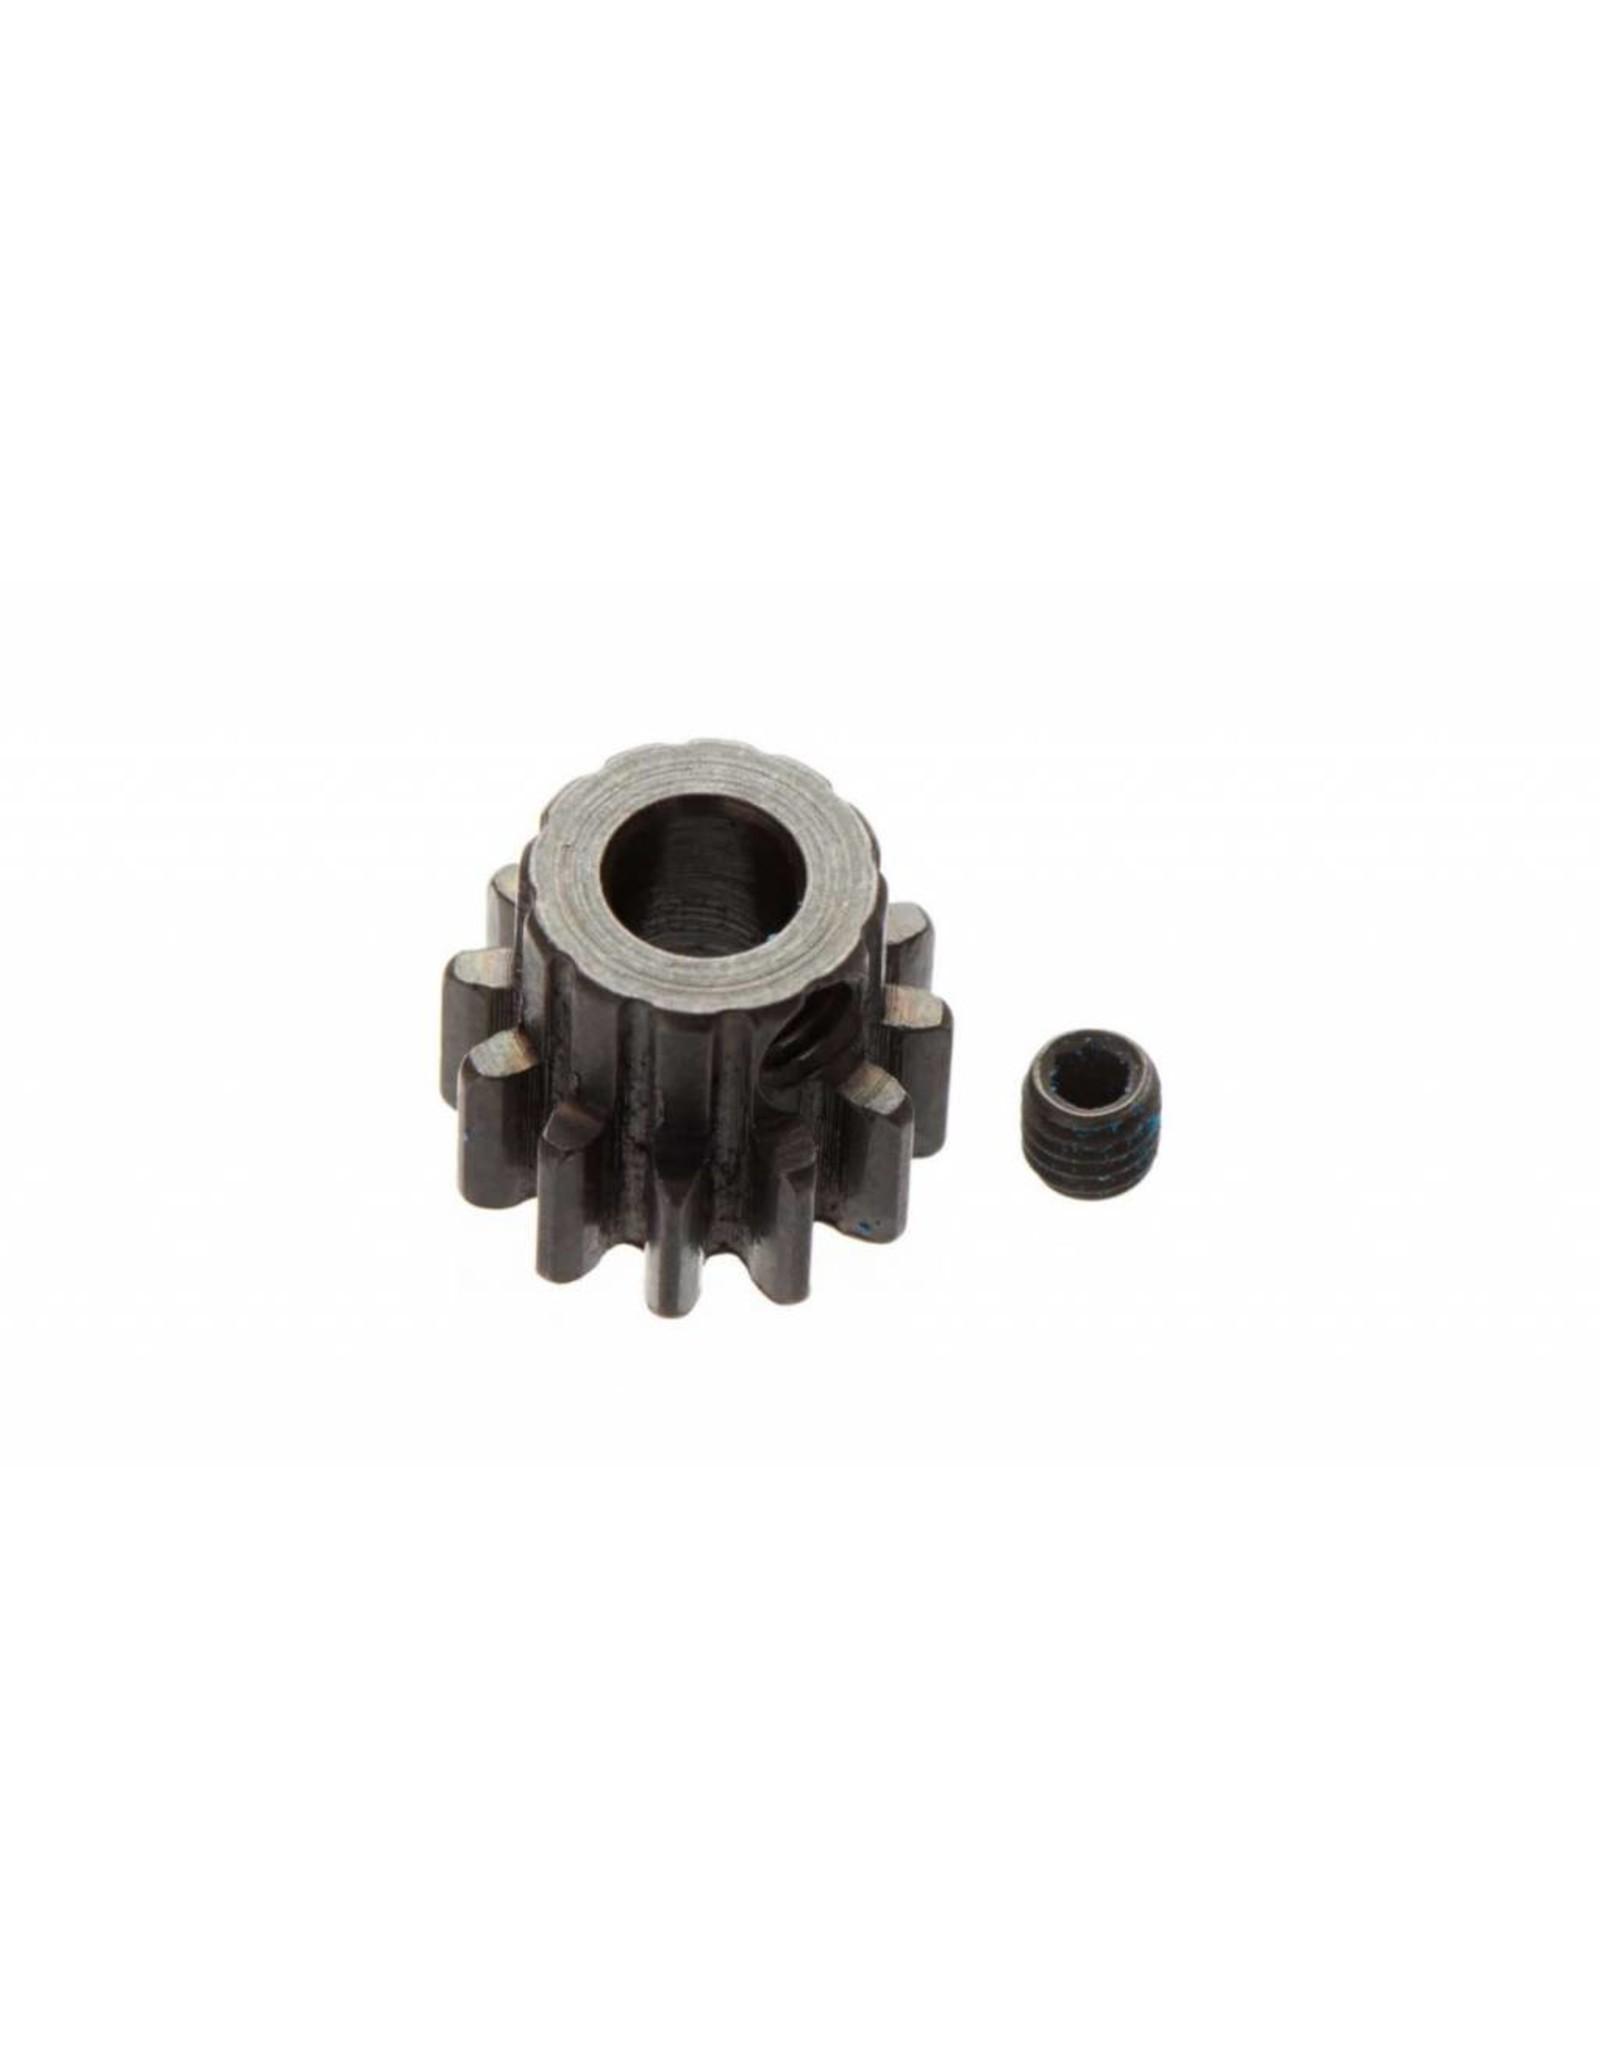 Arrma ARRMA Pinion Gear 12T Mod1 5mm KRATON